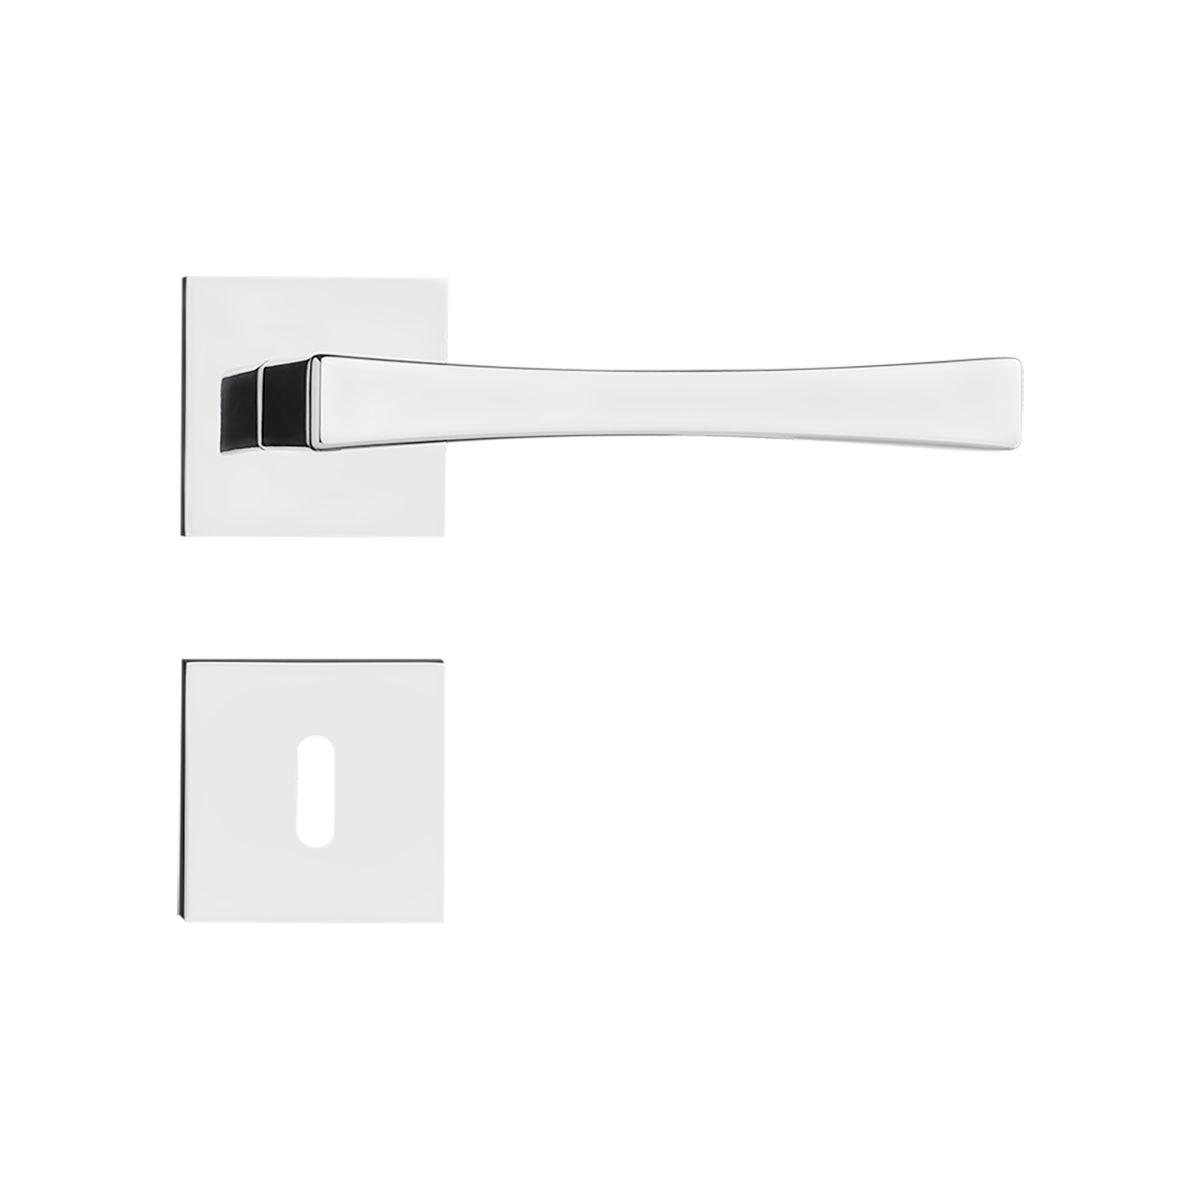 Kit Fechadura Vivaldi CR: 7 Interna; 3 Banheiro